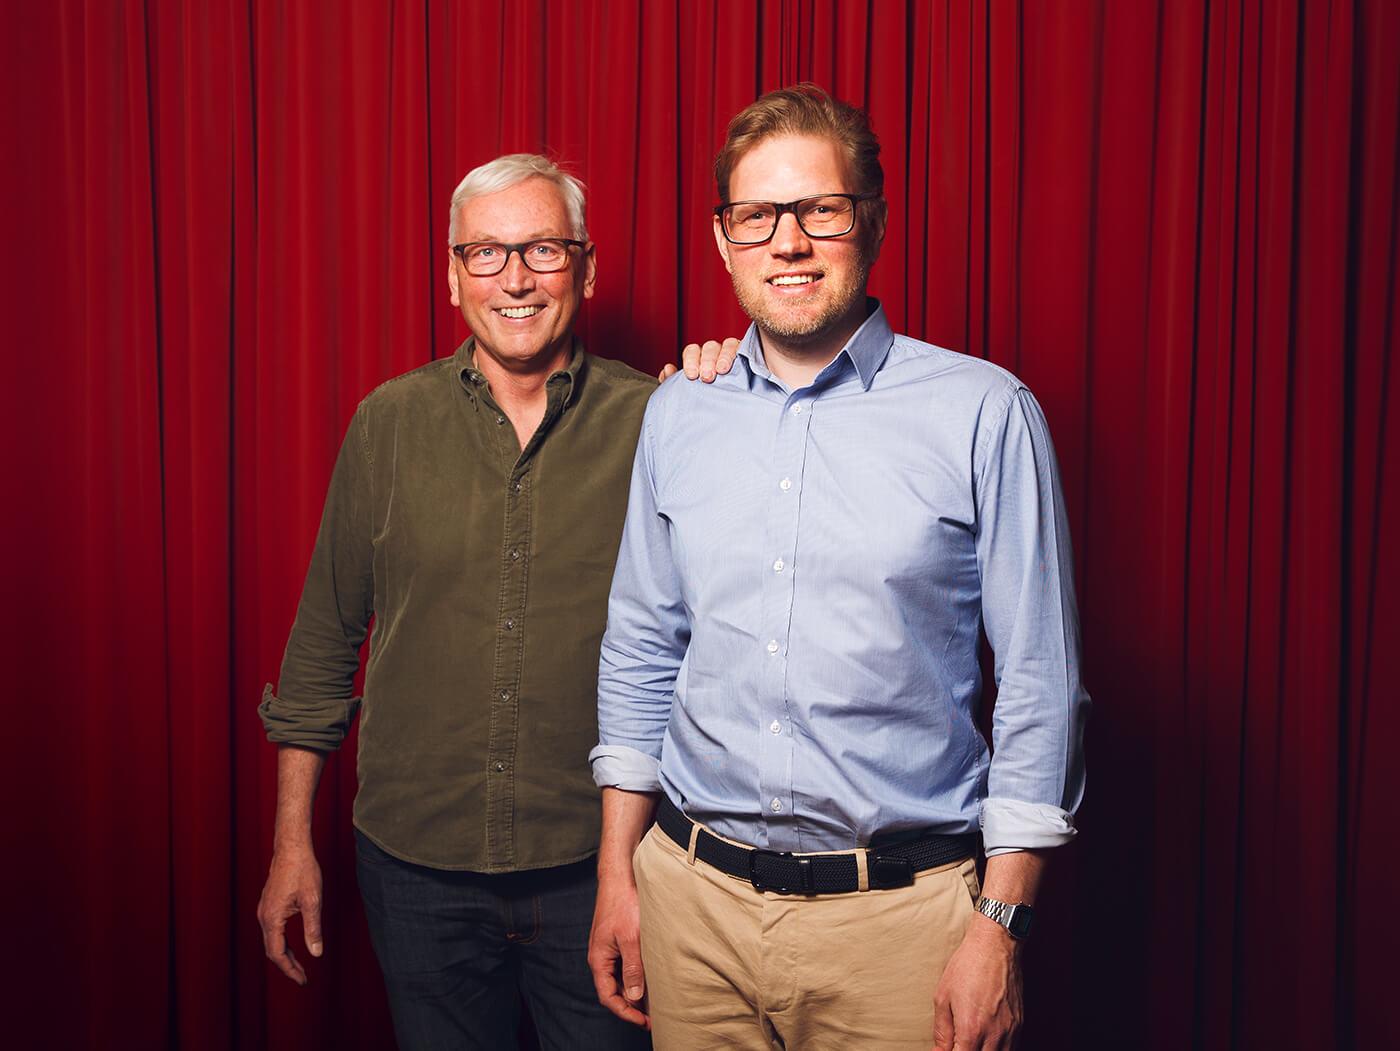 Propellerhead announces Niklas Agevik as its new CEO